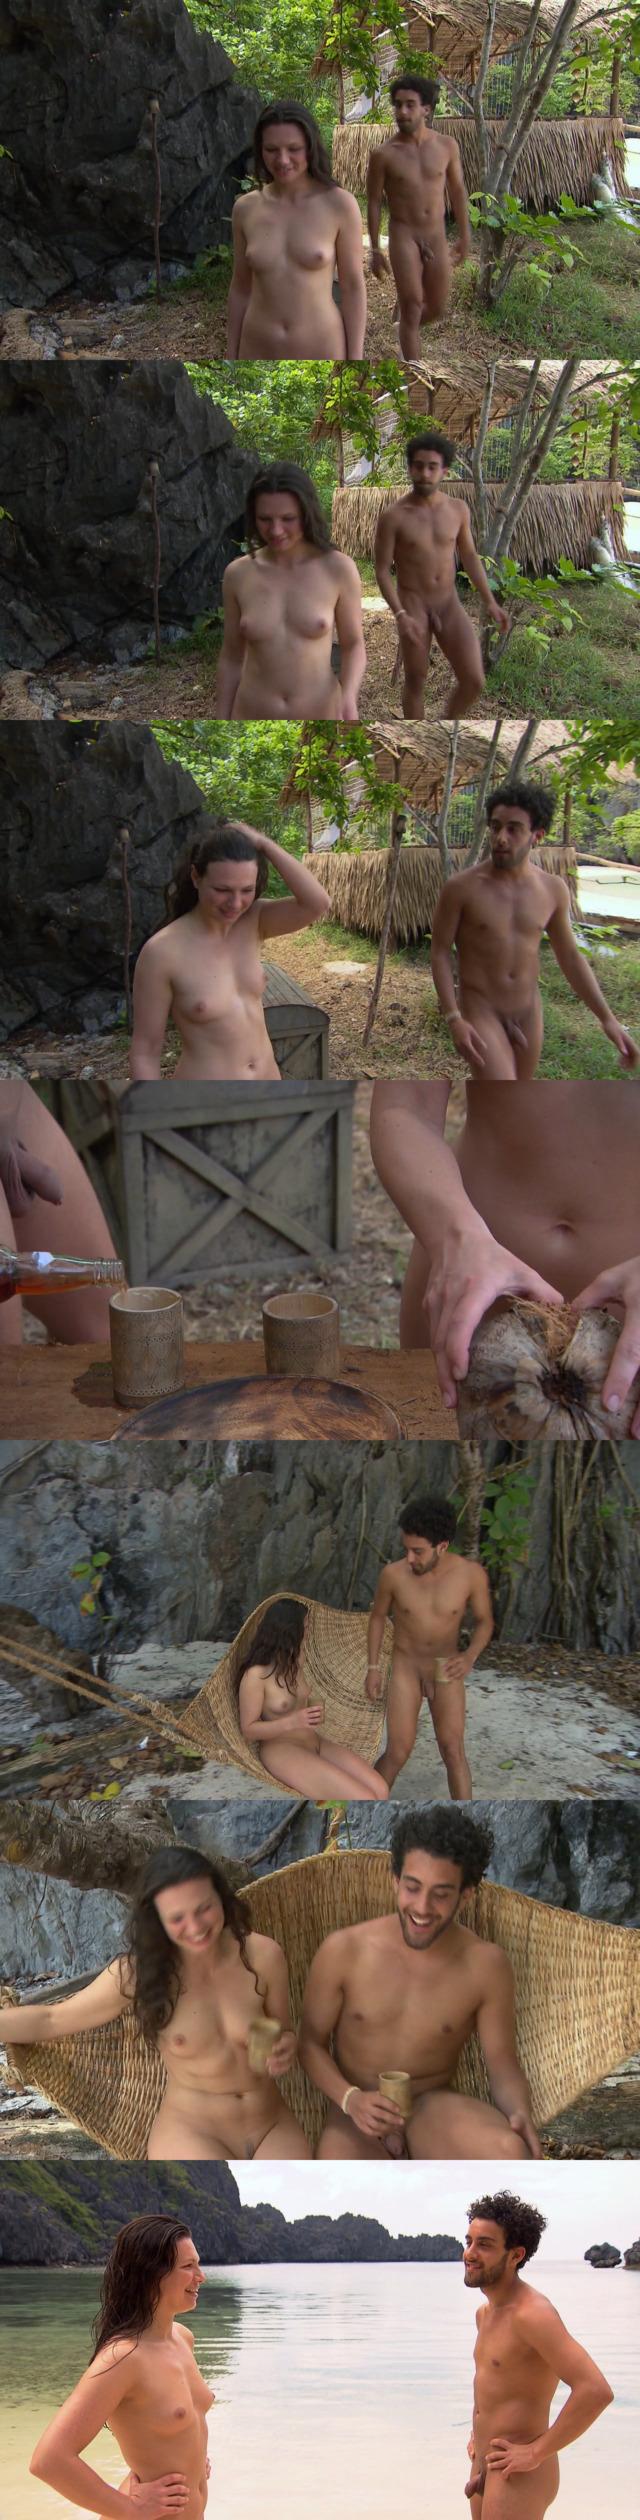 danny-naked-uncut-dick-uncensored-adam-eve